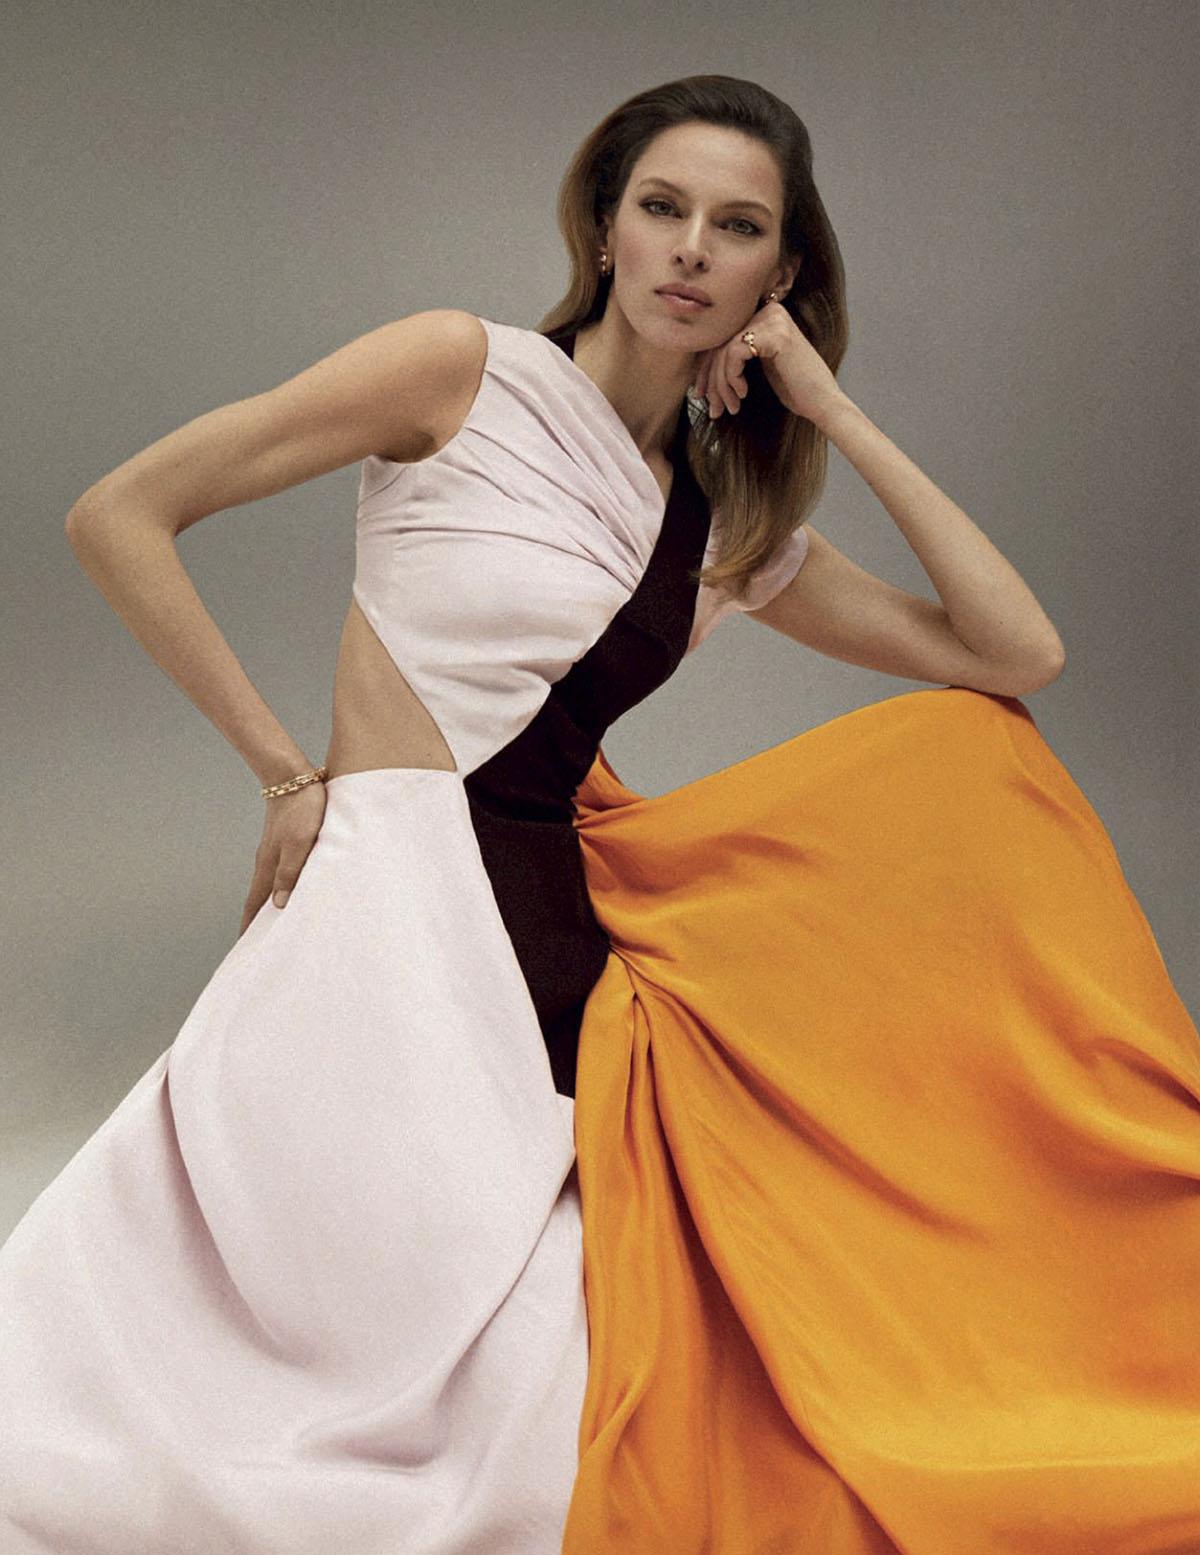 Élise Crombez covers Harper's Bazaar Spain April 2021 by Xavi Gordo